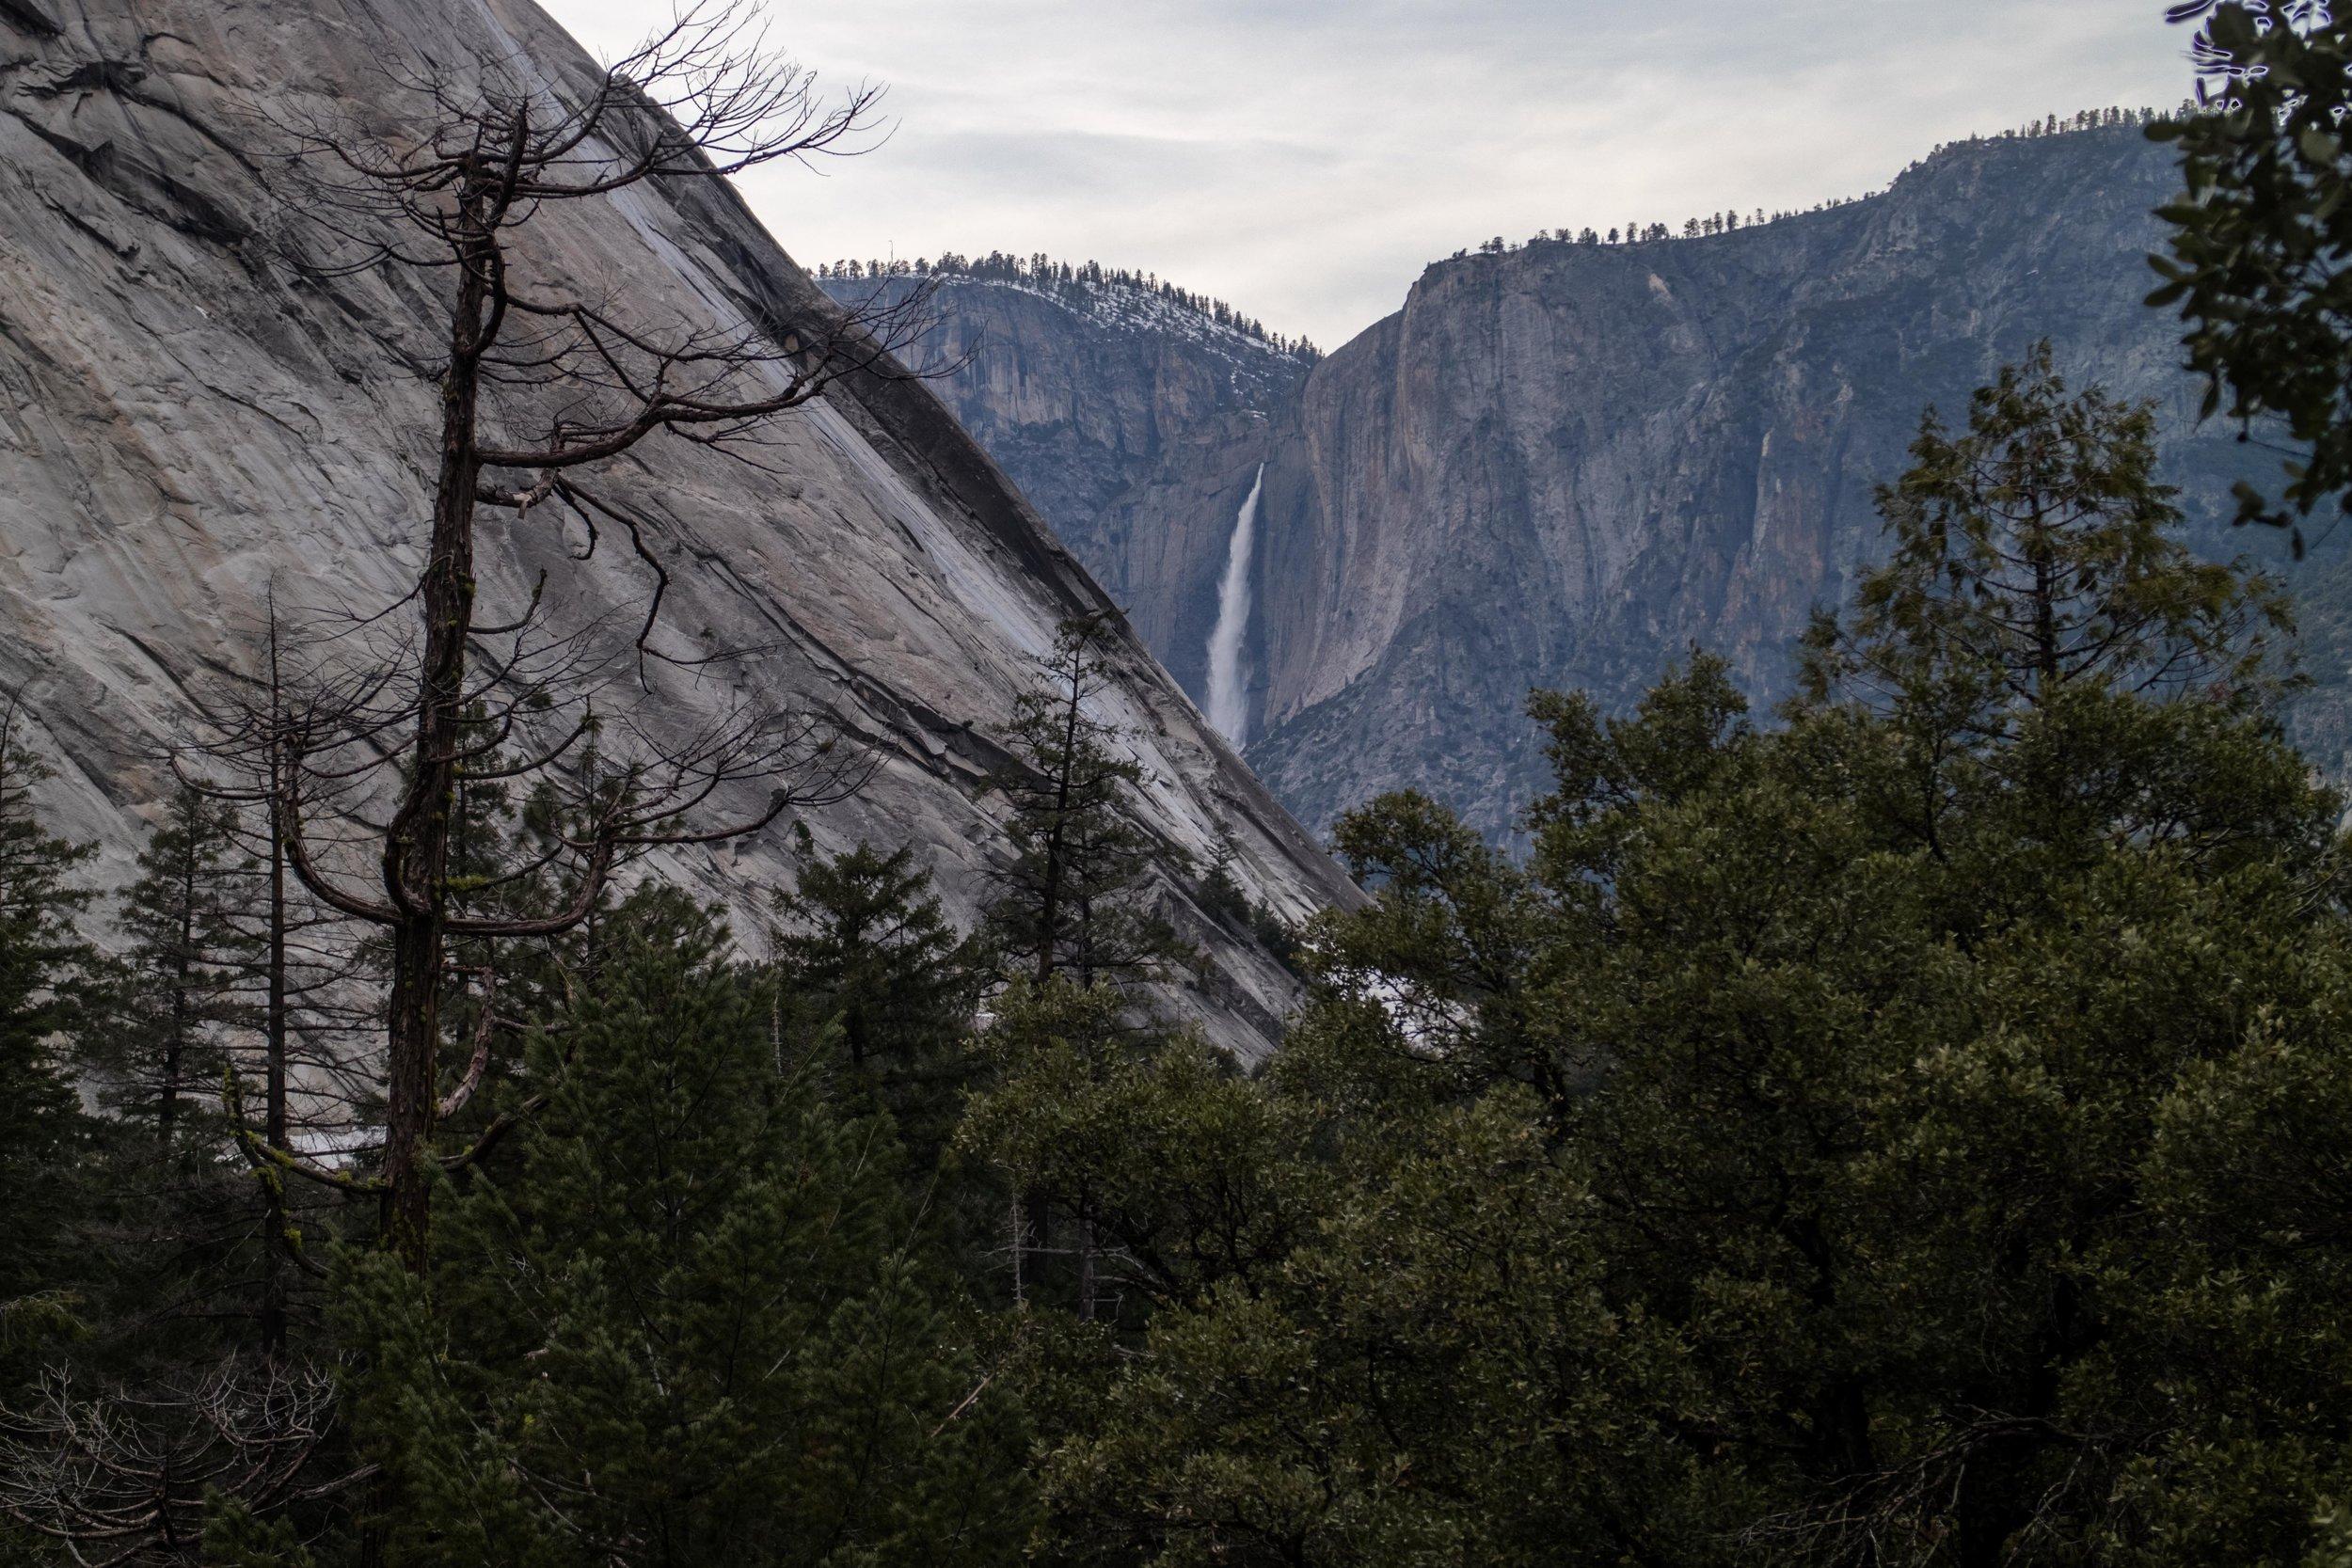 Yosemite Falls from afar.